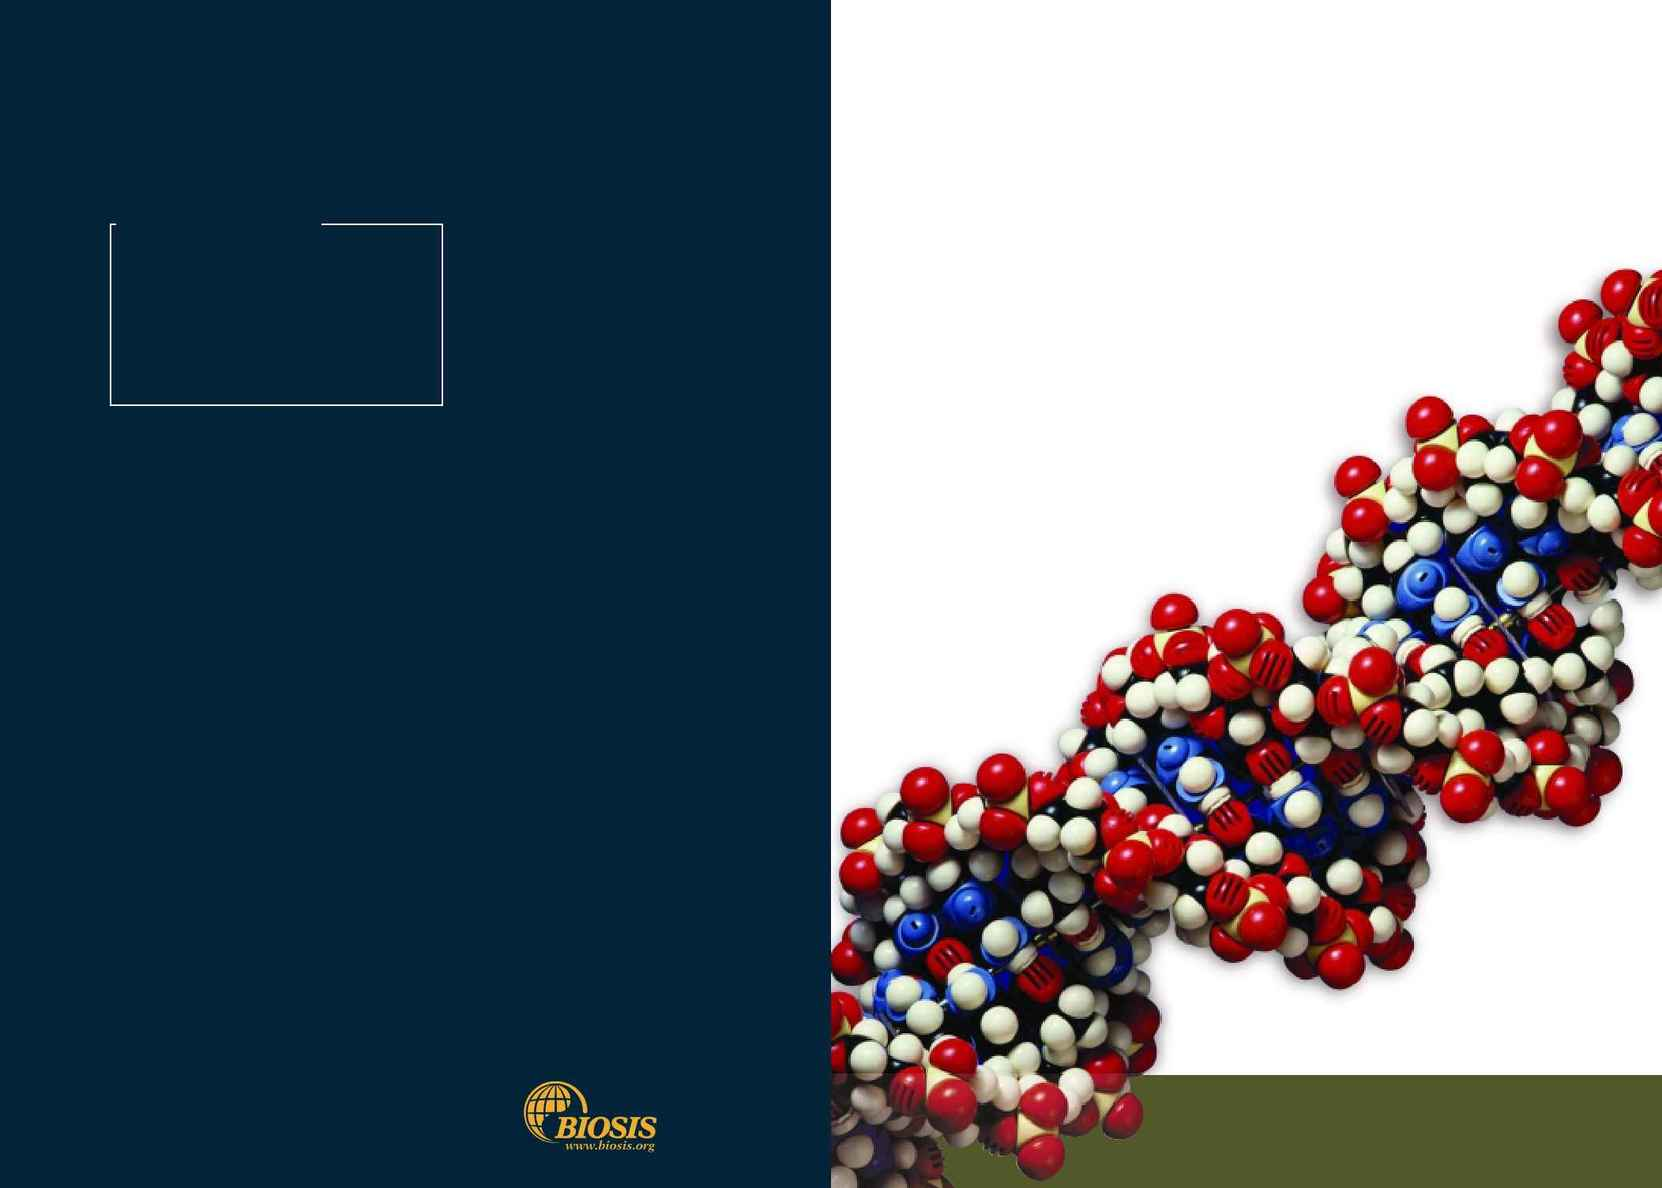 Biosis - bp brochure